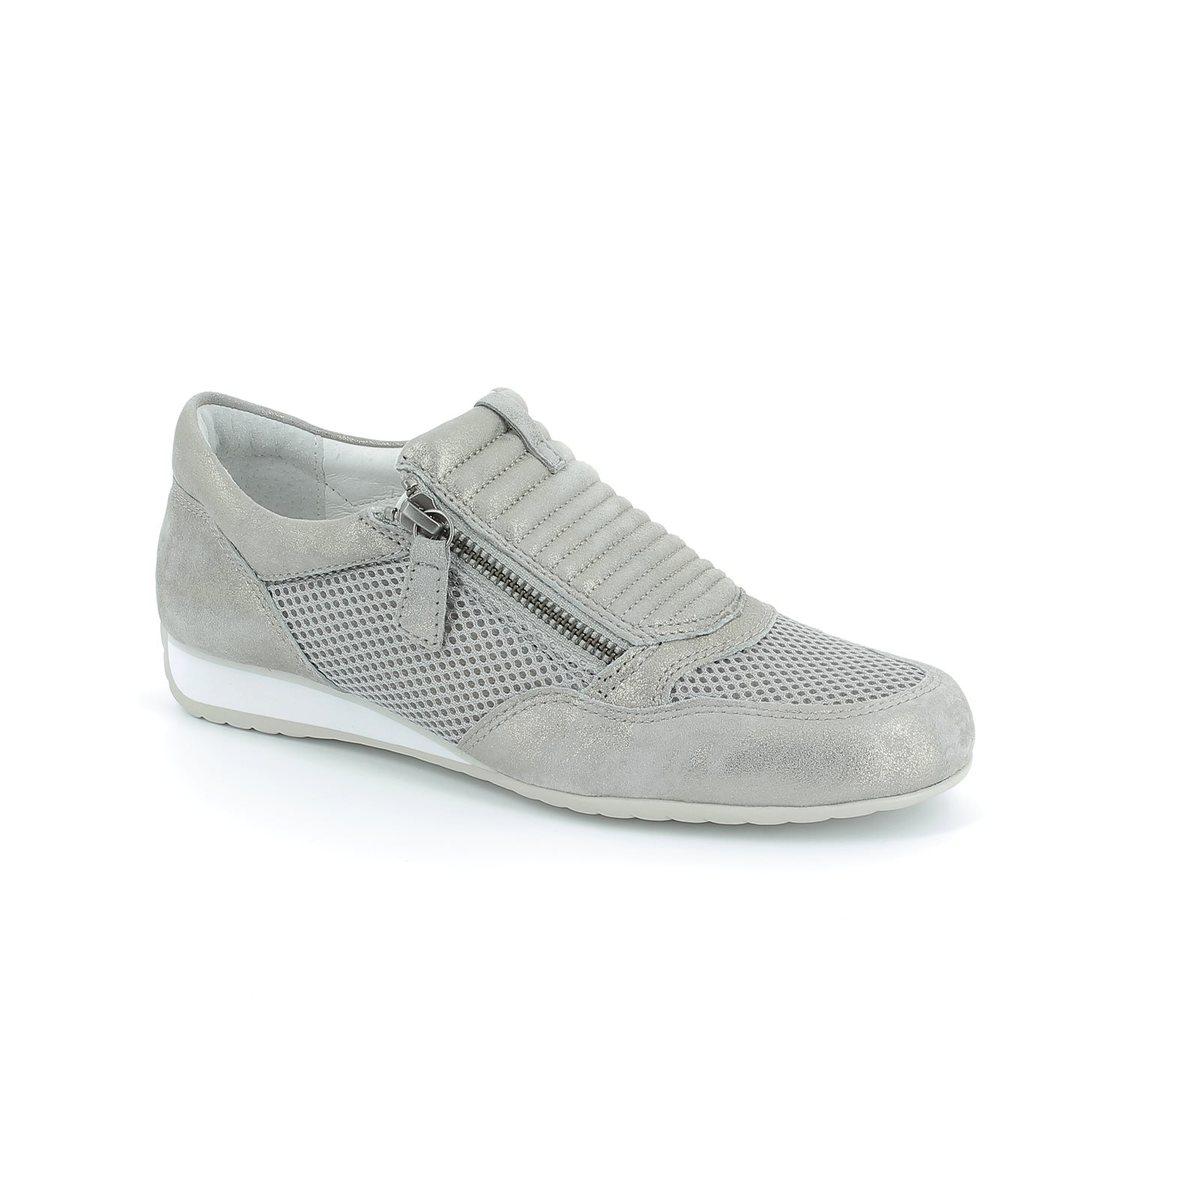 Gabor Comfort Shoes - Beige multi - 46.352.93 BRUNELLO